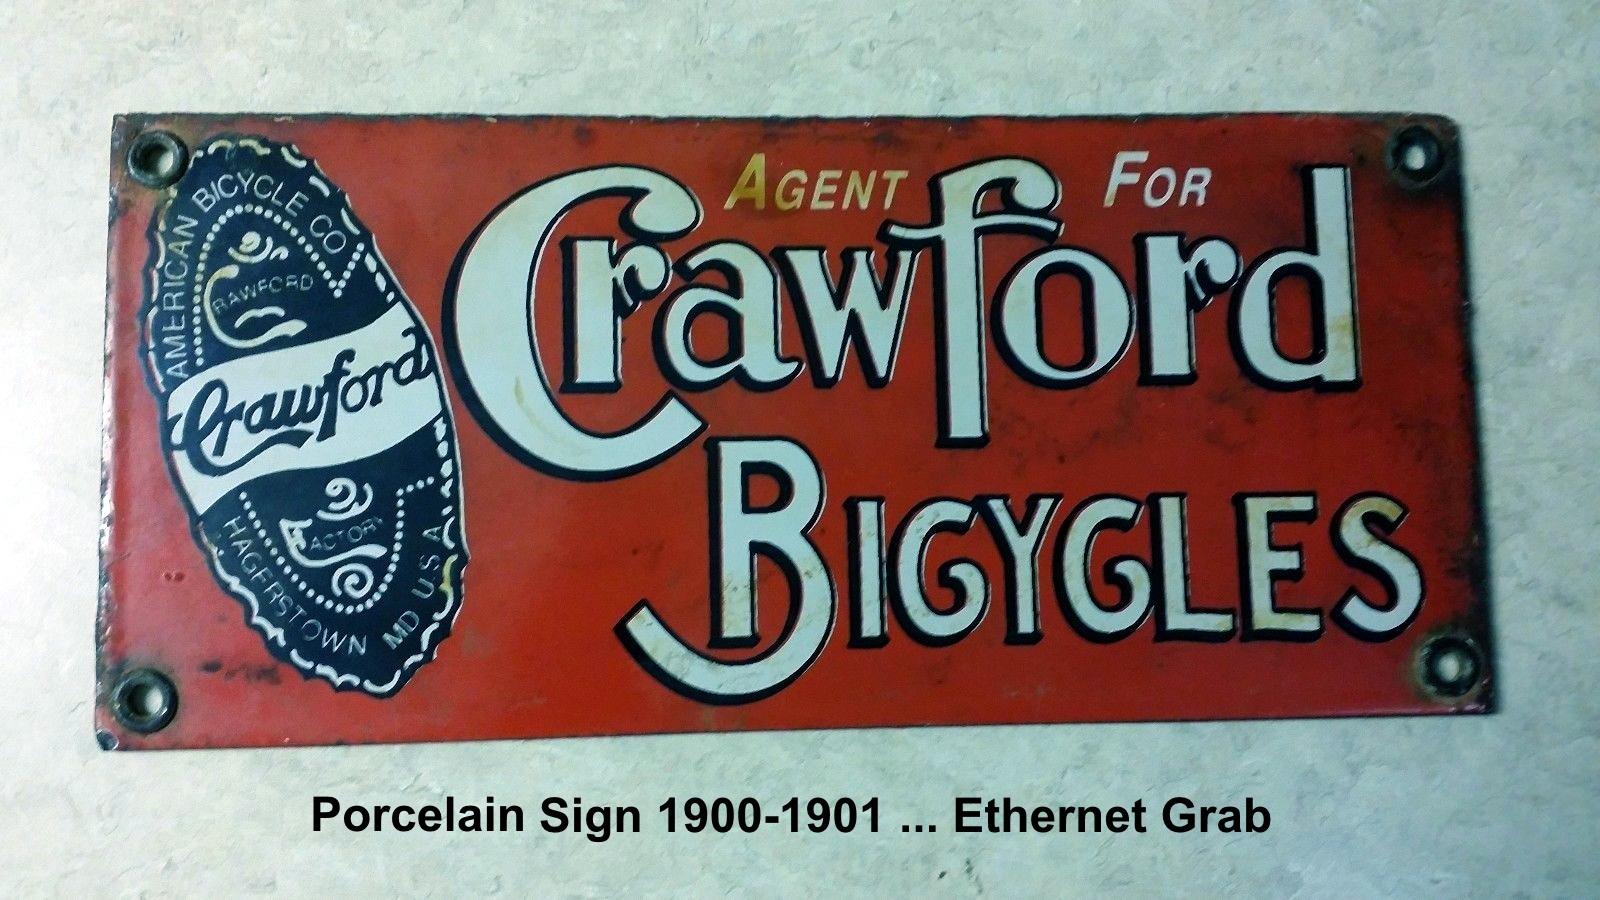 658a8  crawford.jpg